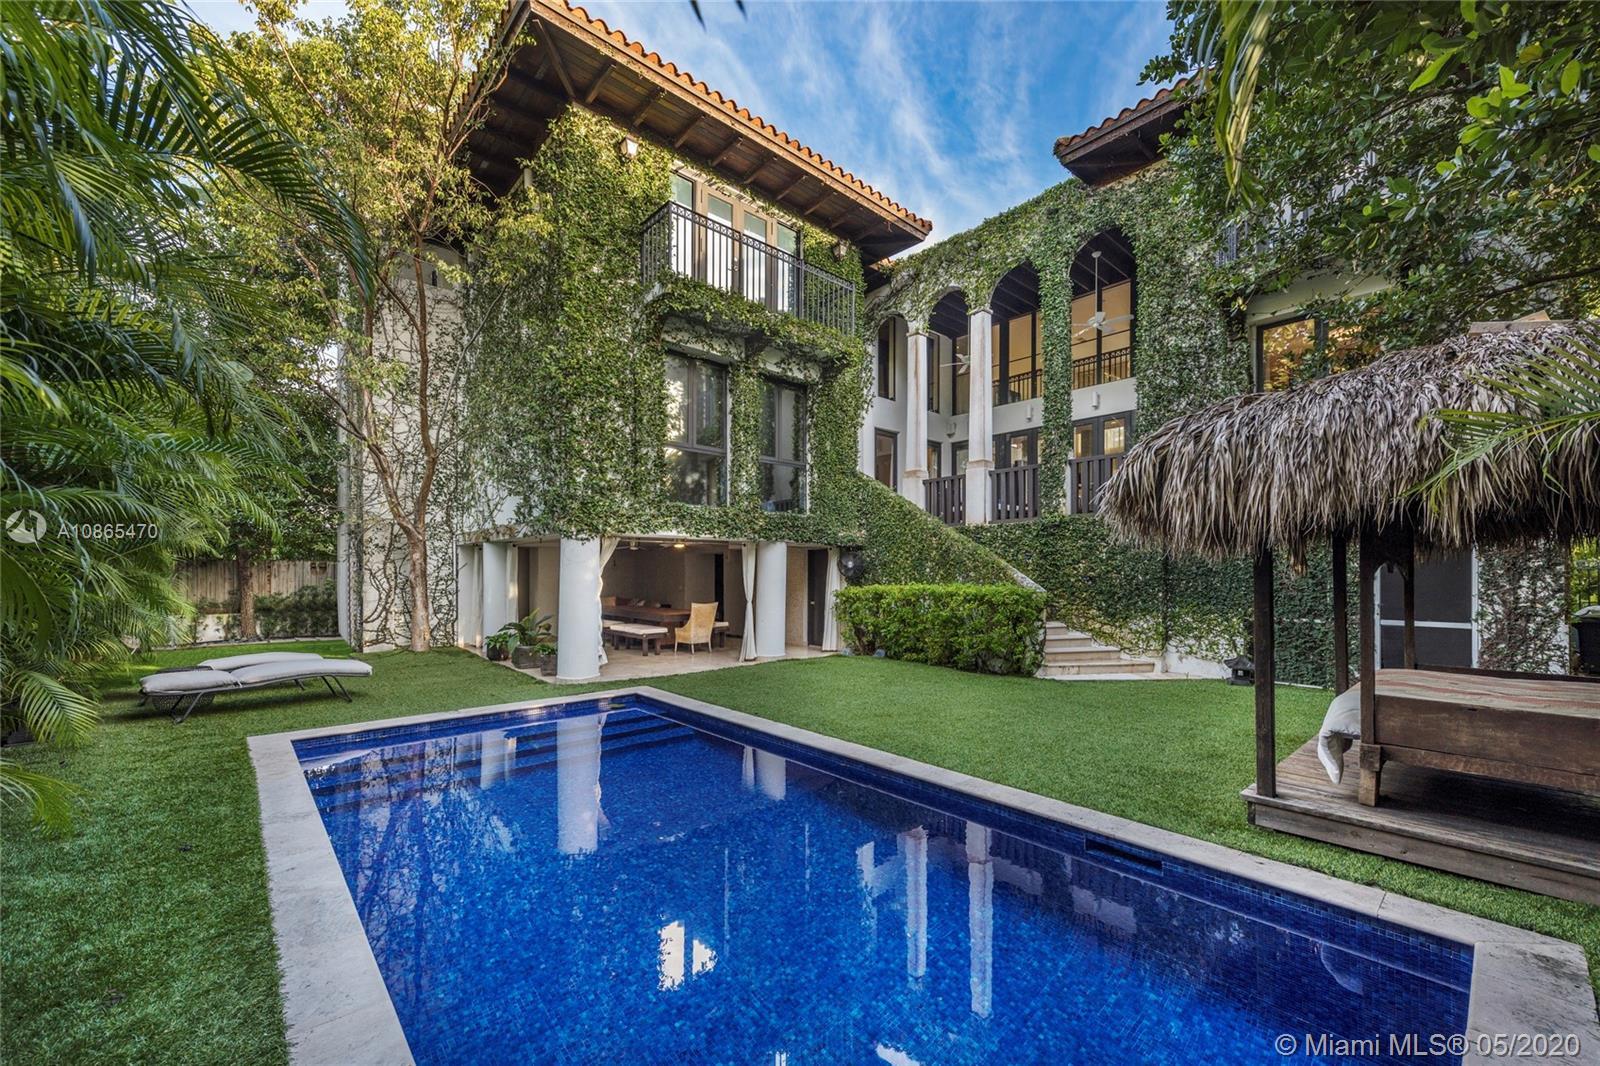 341 Palmwood Ln, Key Biscayne, Florida 33149, 6 Bedrooms Bedrooms, ,7 BathroomsBathrooms,Residential,For Sale,341 Palmwood Ln,A10865470